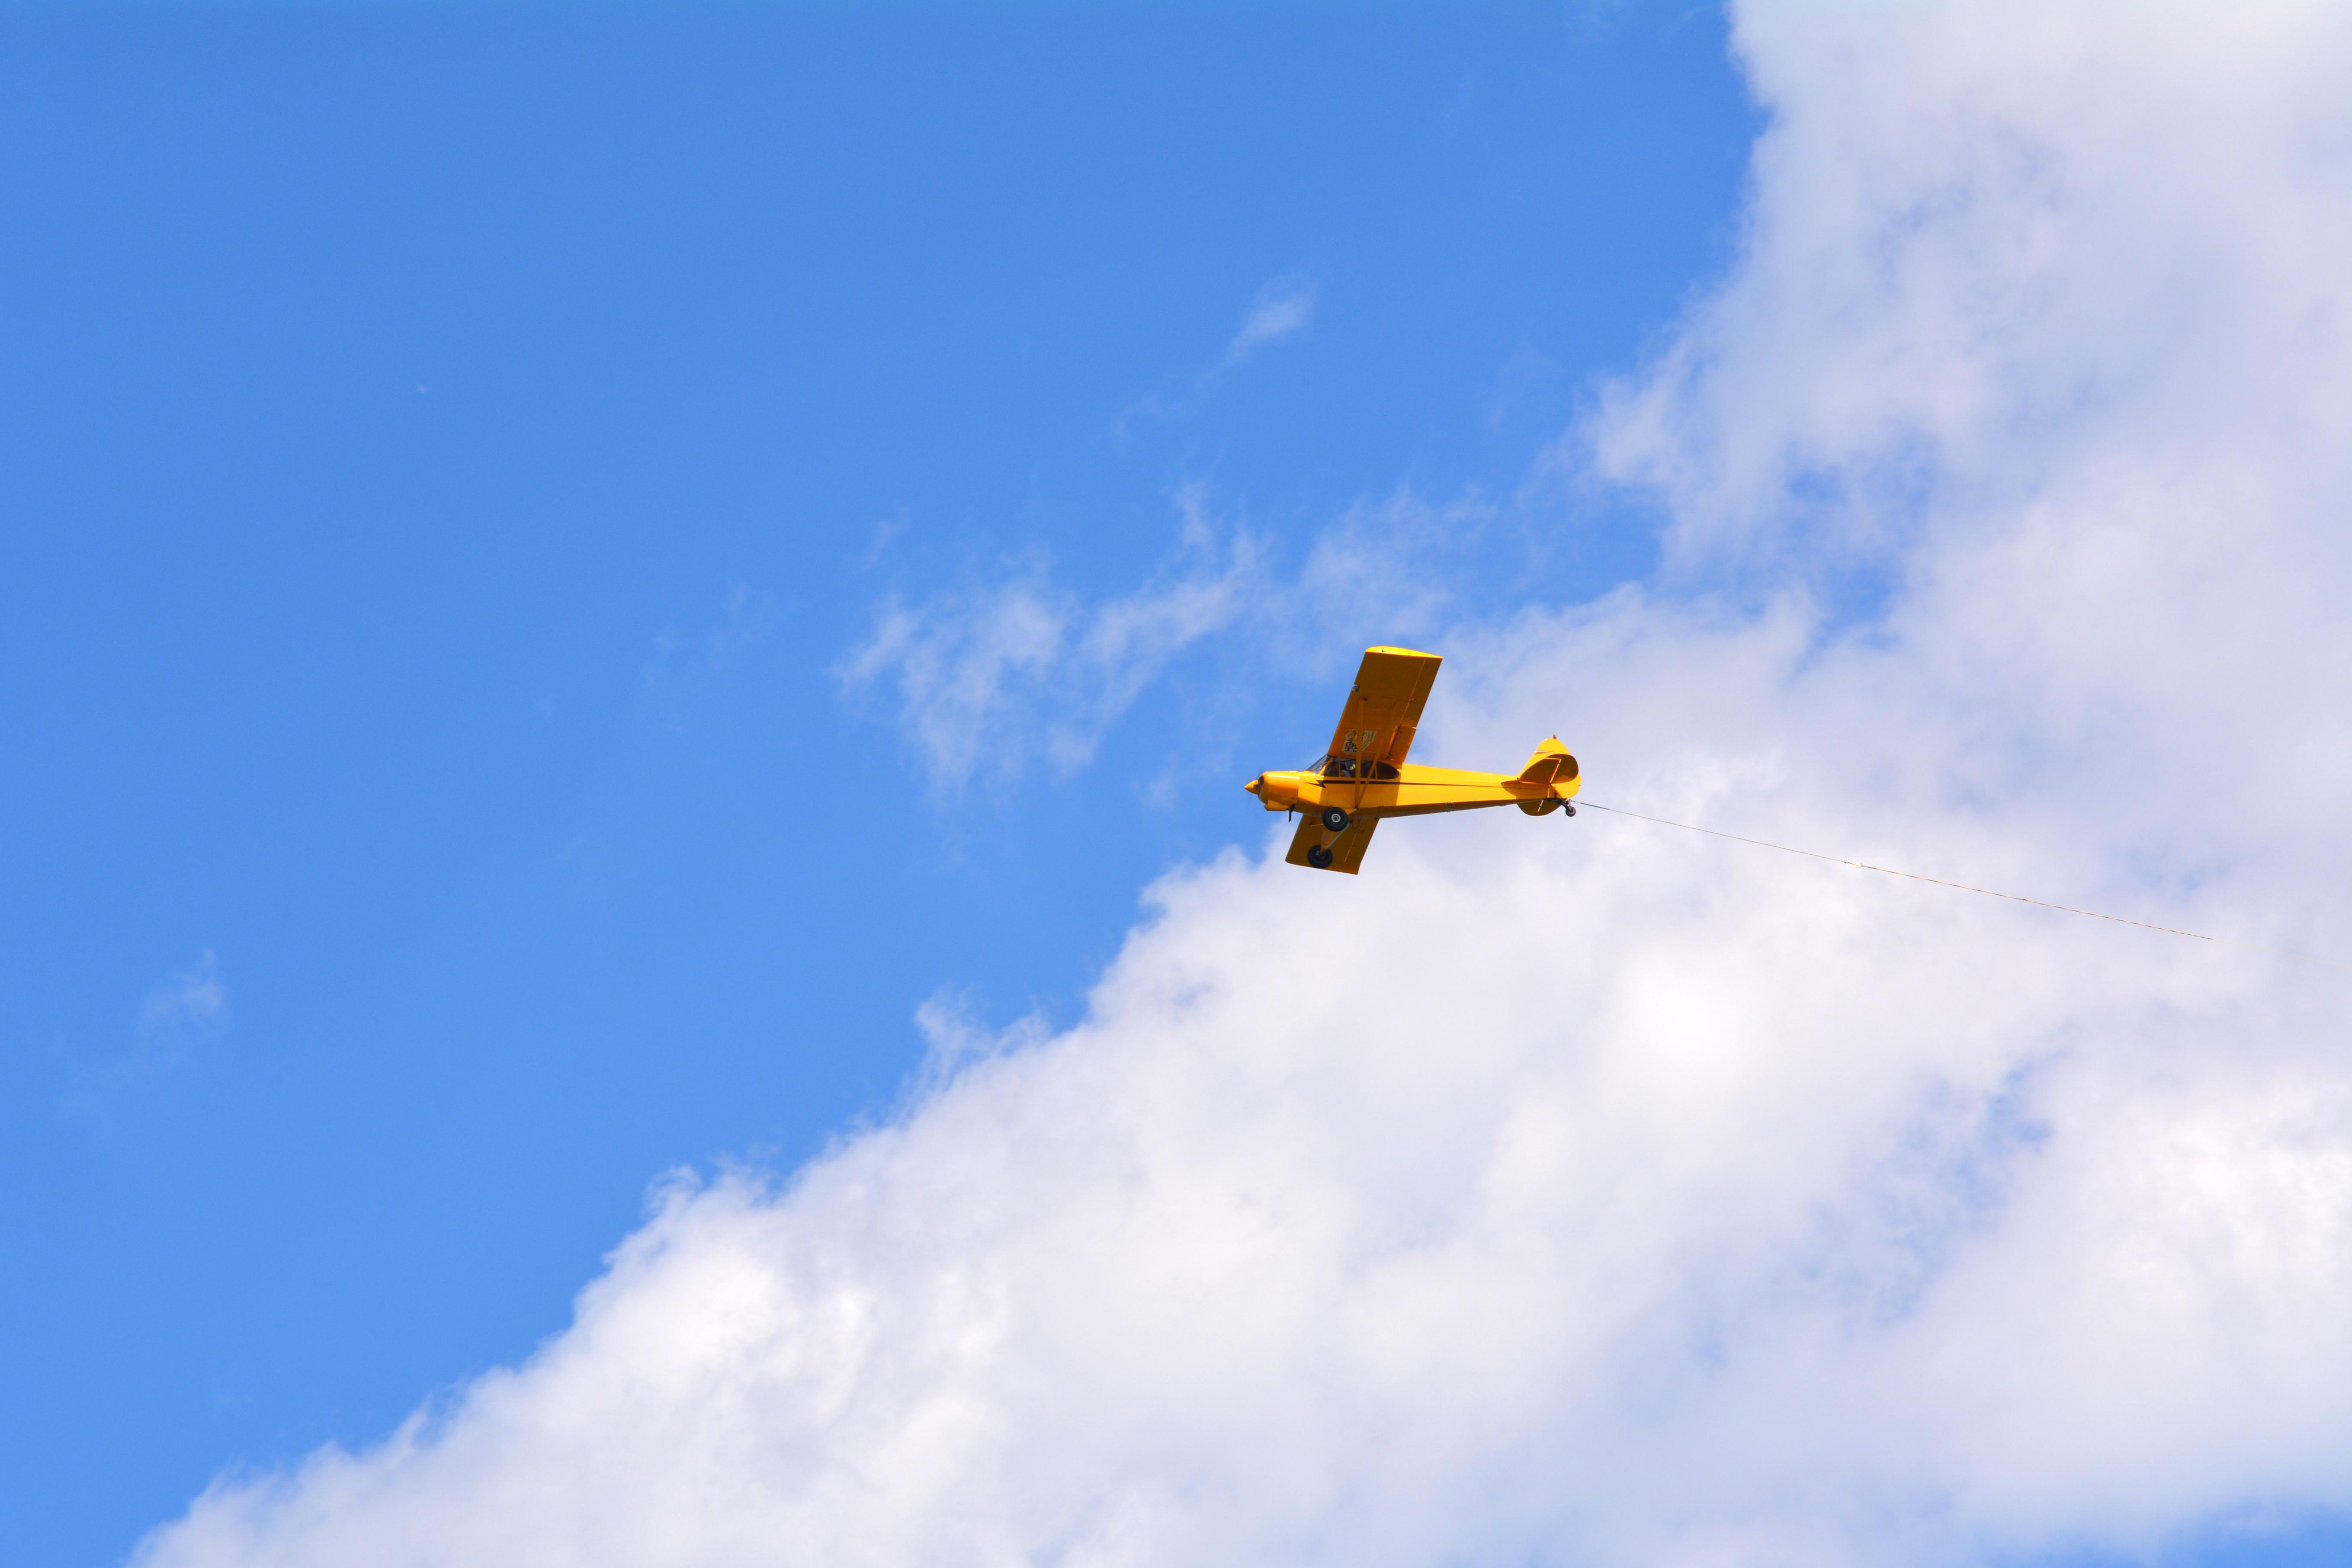 A small plane in flight